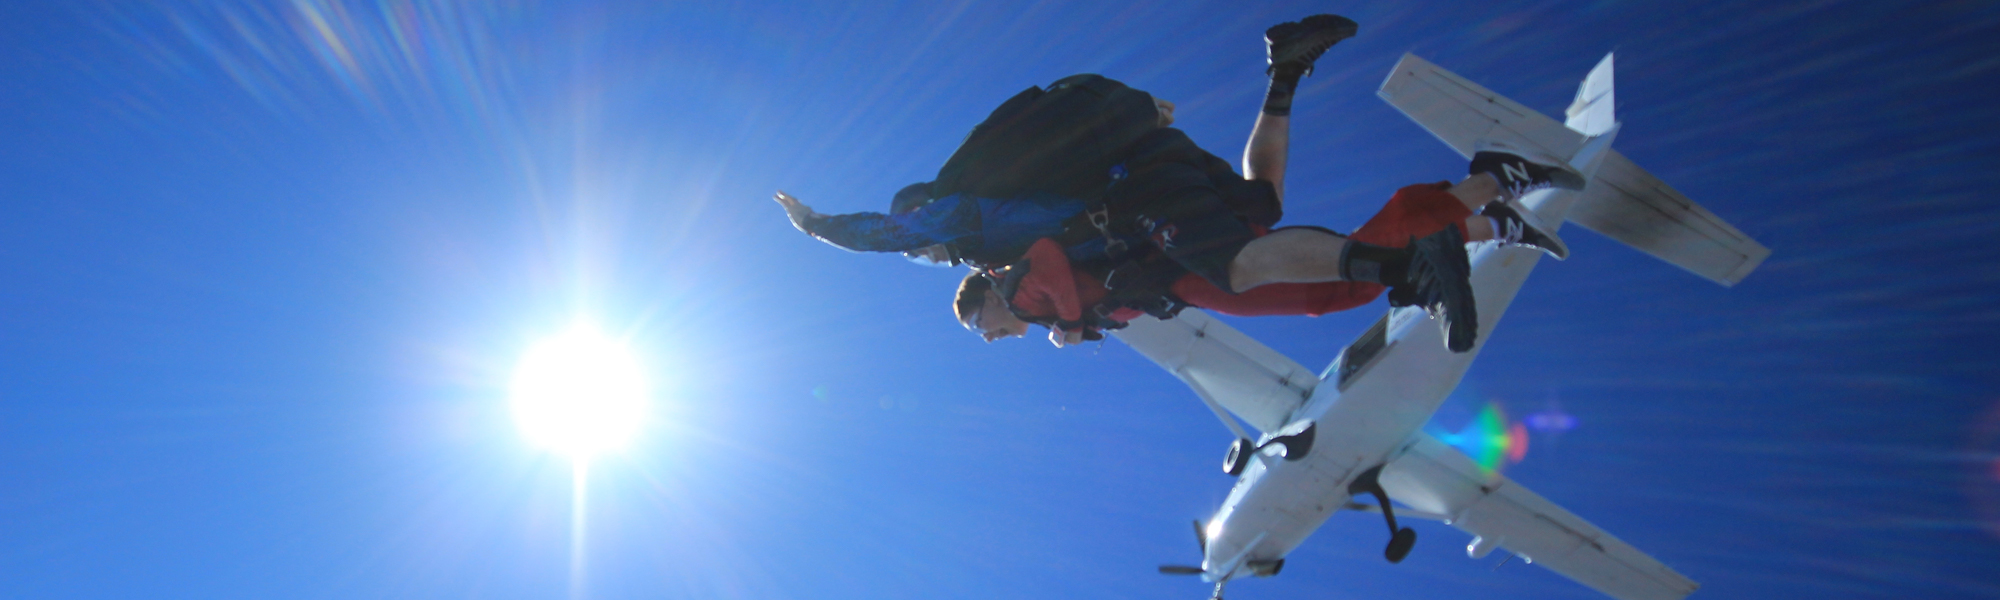 Tandem Skydiving: Common Questions - Skydive Spaceland Atlanta